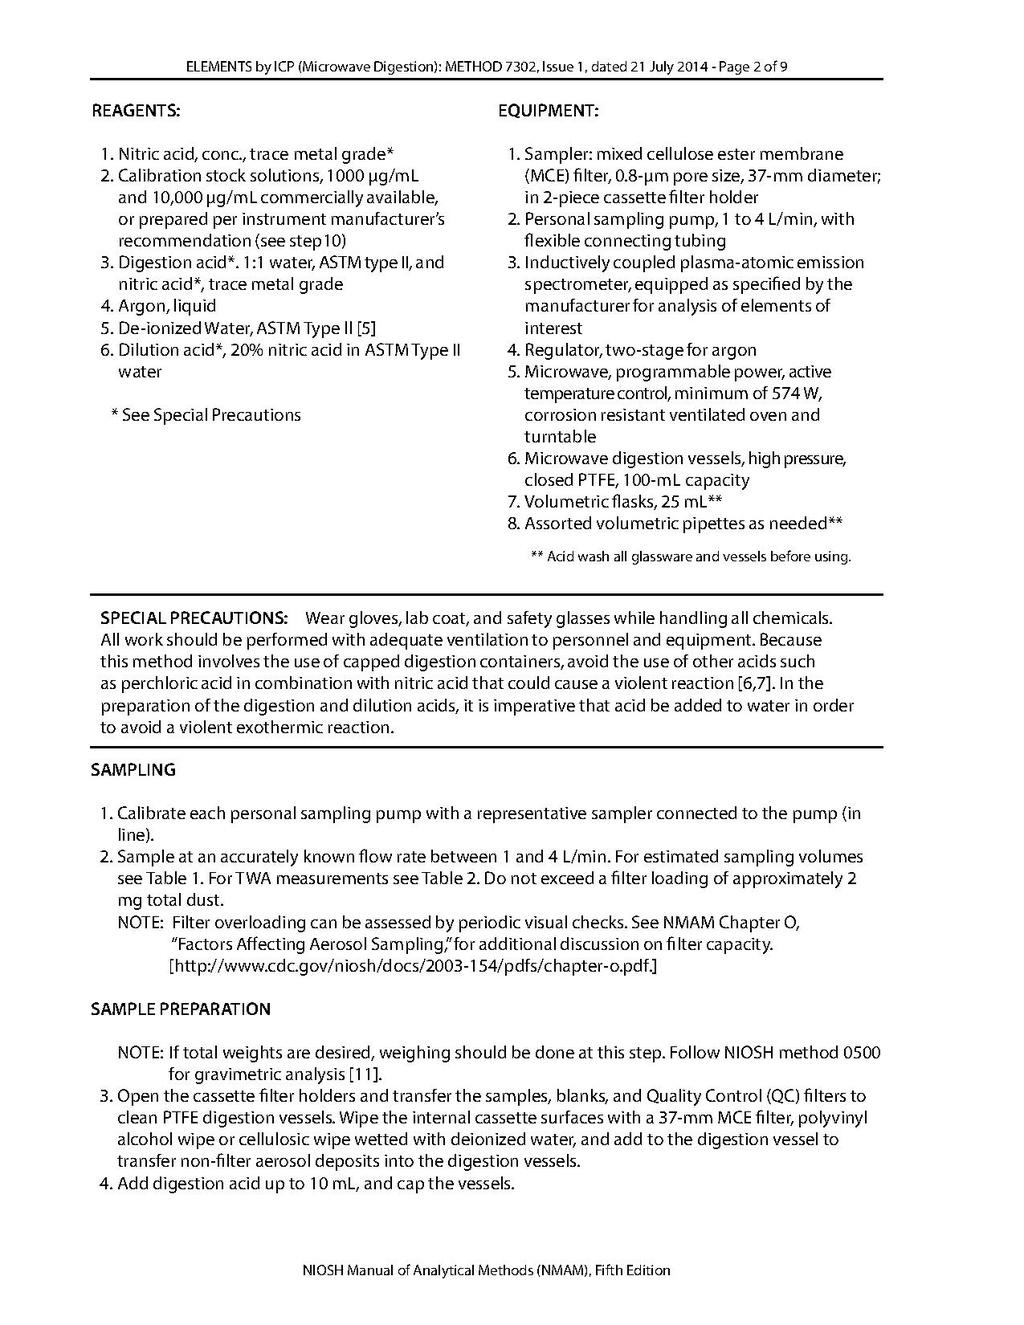 Page:NIOSH Manual of Analytical Methods - 7302 pdf/2